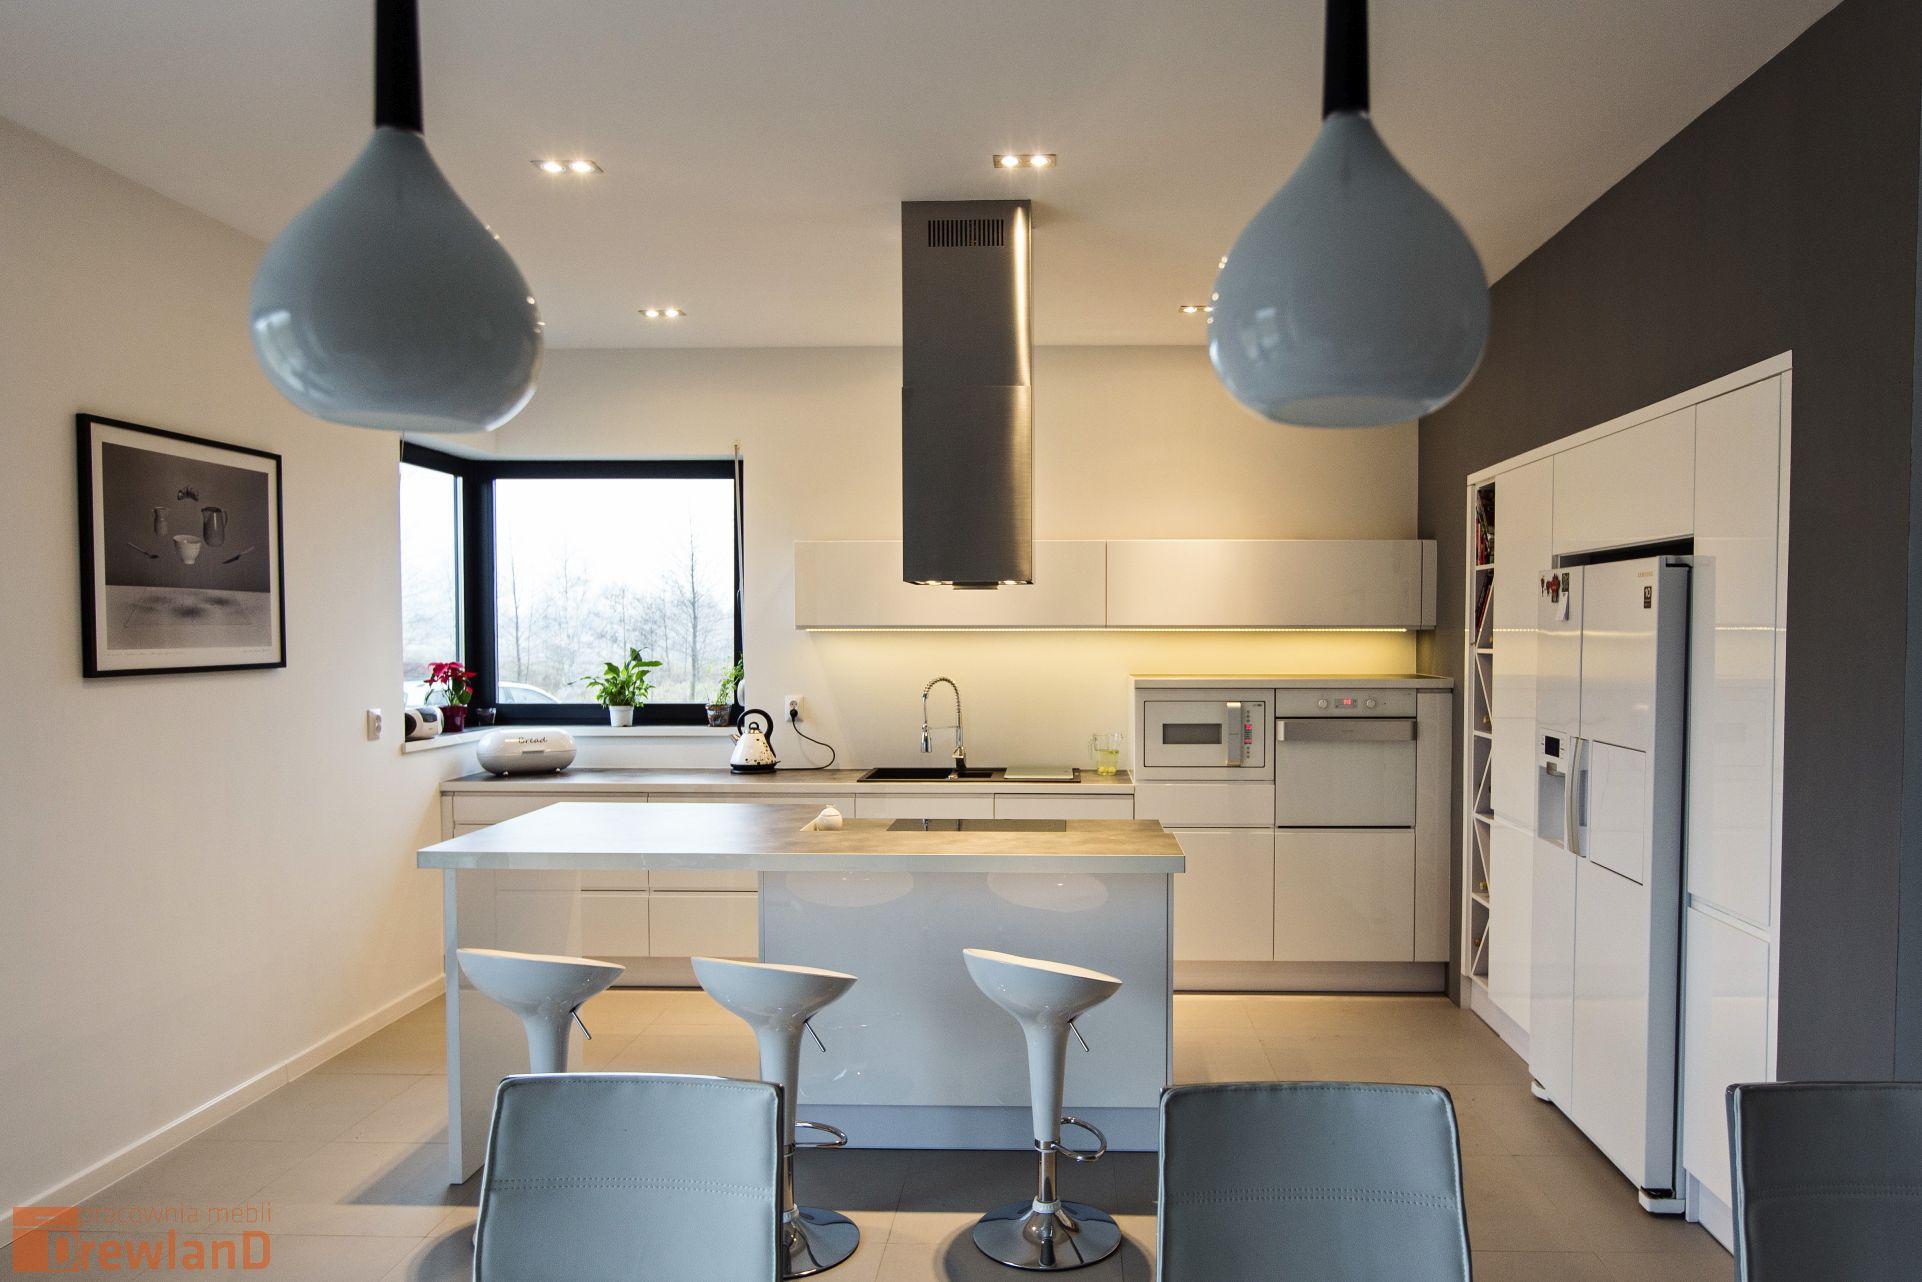 Przytulna Kuchnia  Drewland pl -> Otwarta Kuchnia Jadalnia Salon